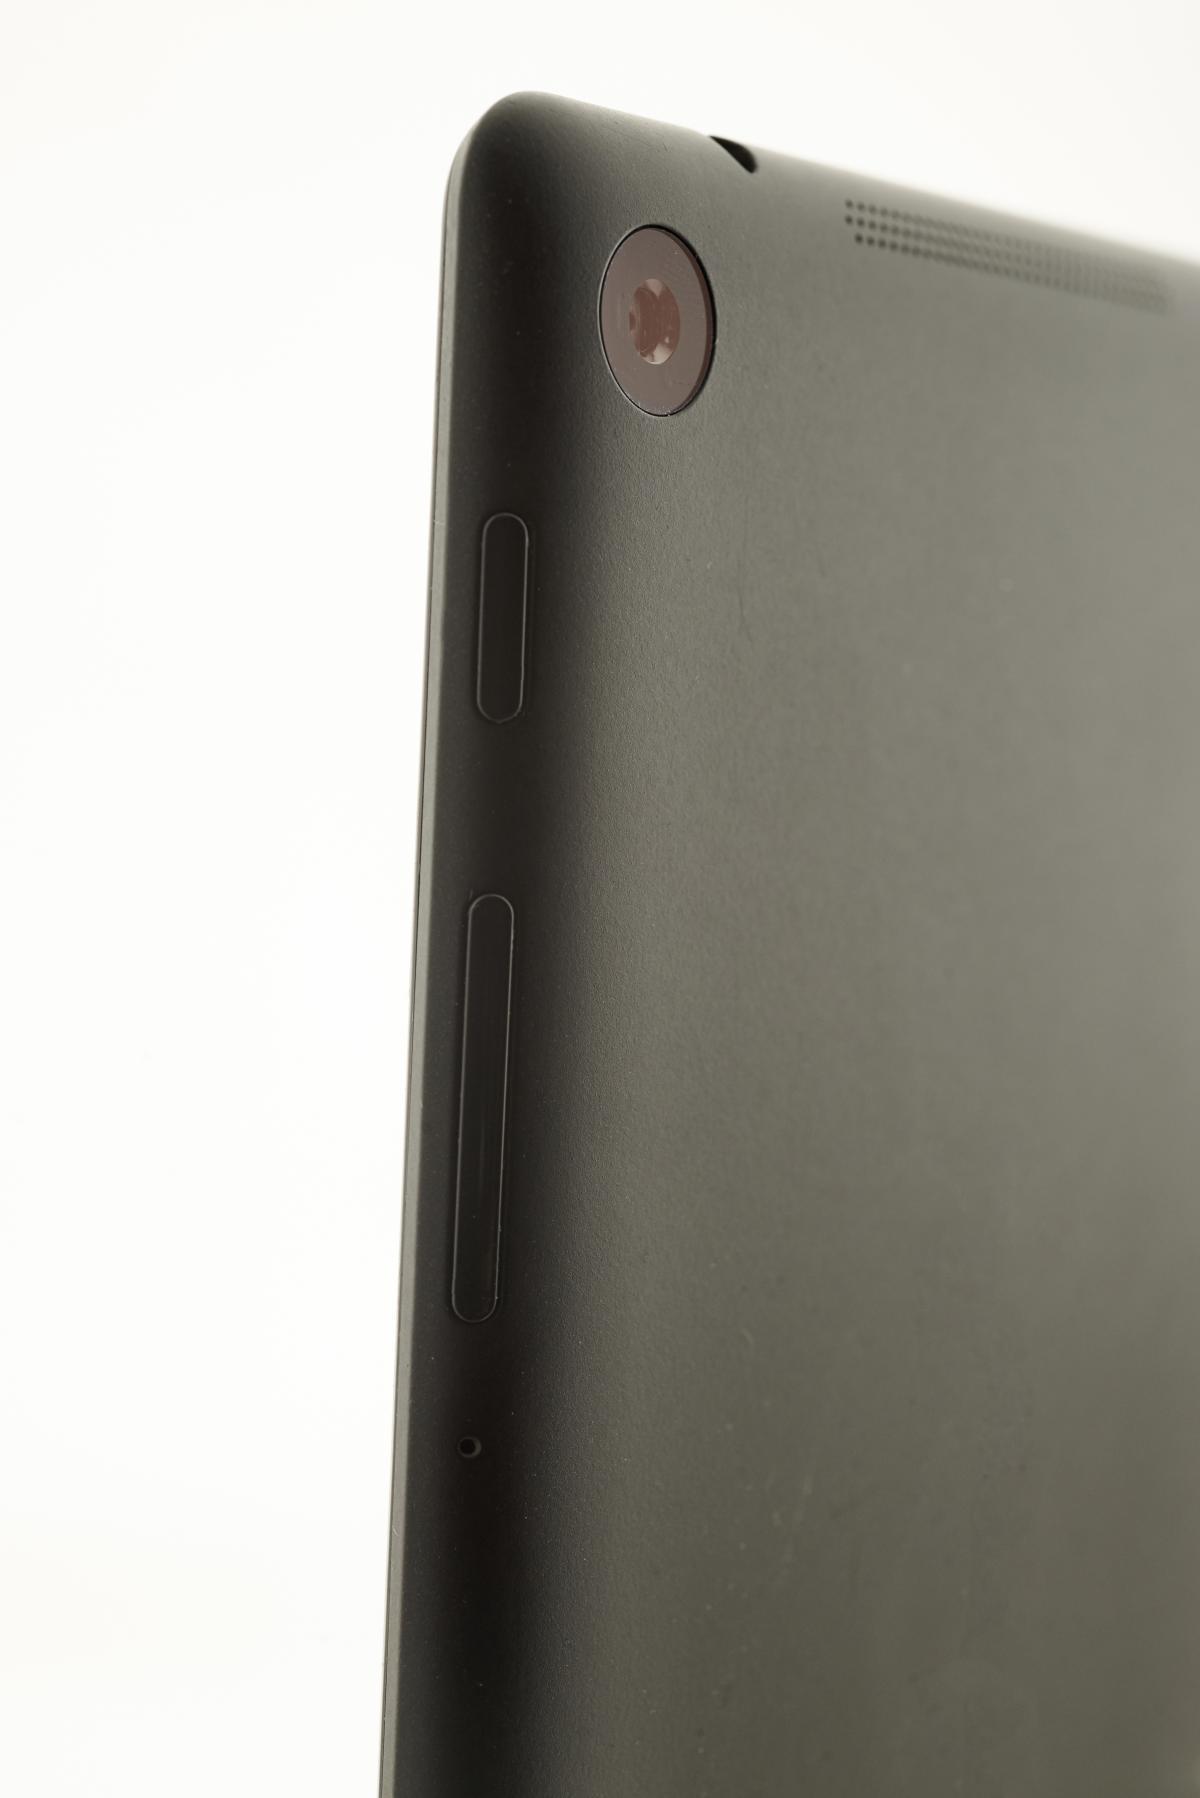 Device Pen External drive #420112